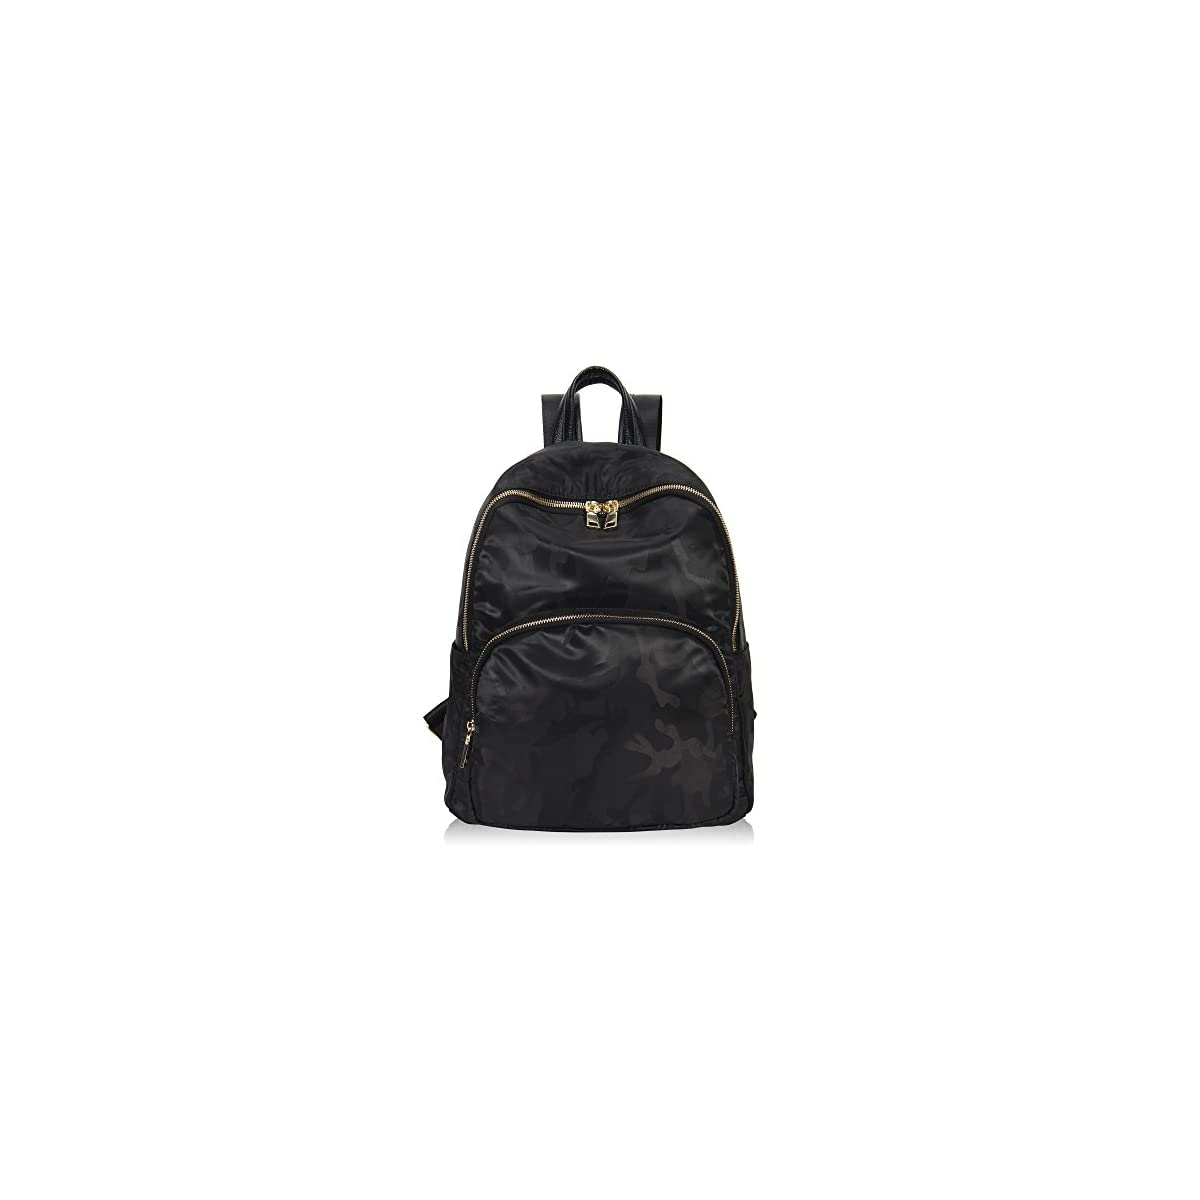 41bW6aXPNuL. SS1200  - Veevan Mochila Nylon Moda Mujer Mochila Escolar Casual Camo Oscuro